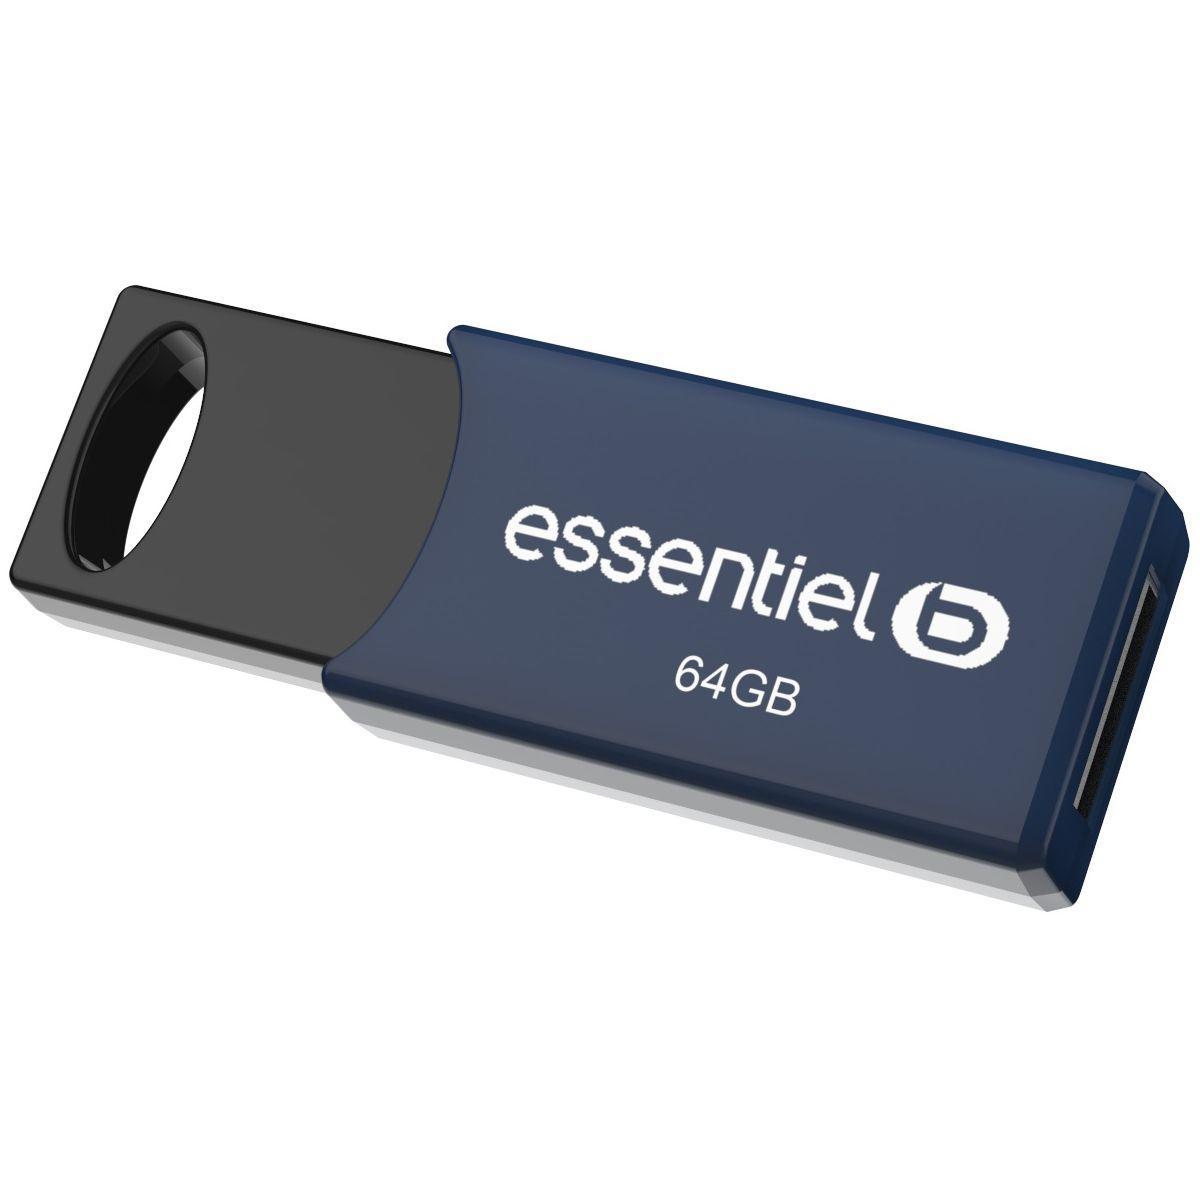 Cl� usb essentielb usb 64gb 2.0 - livraison offerte : code premium (photo)